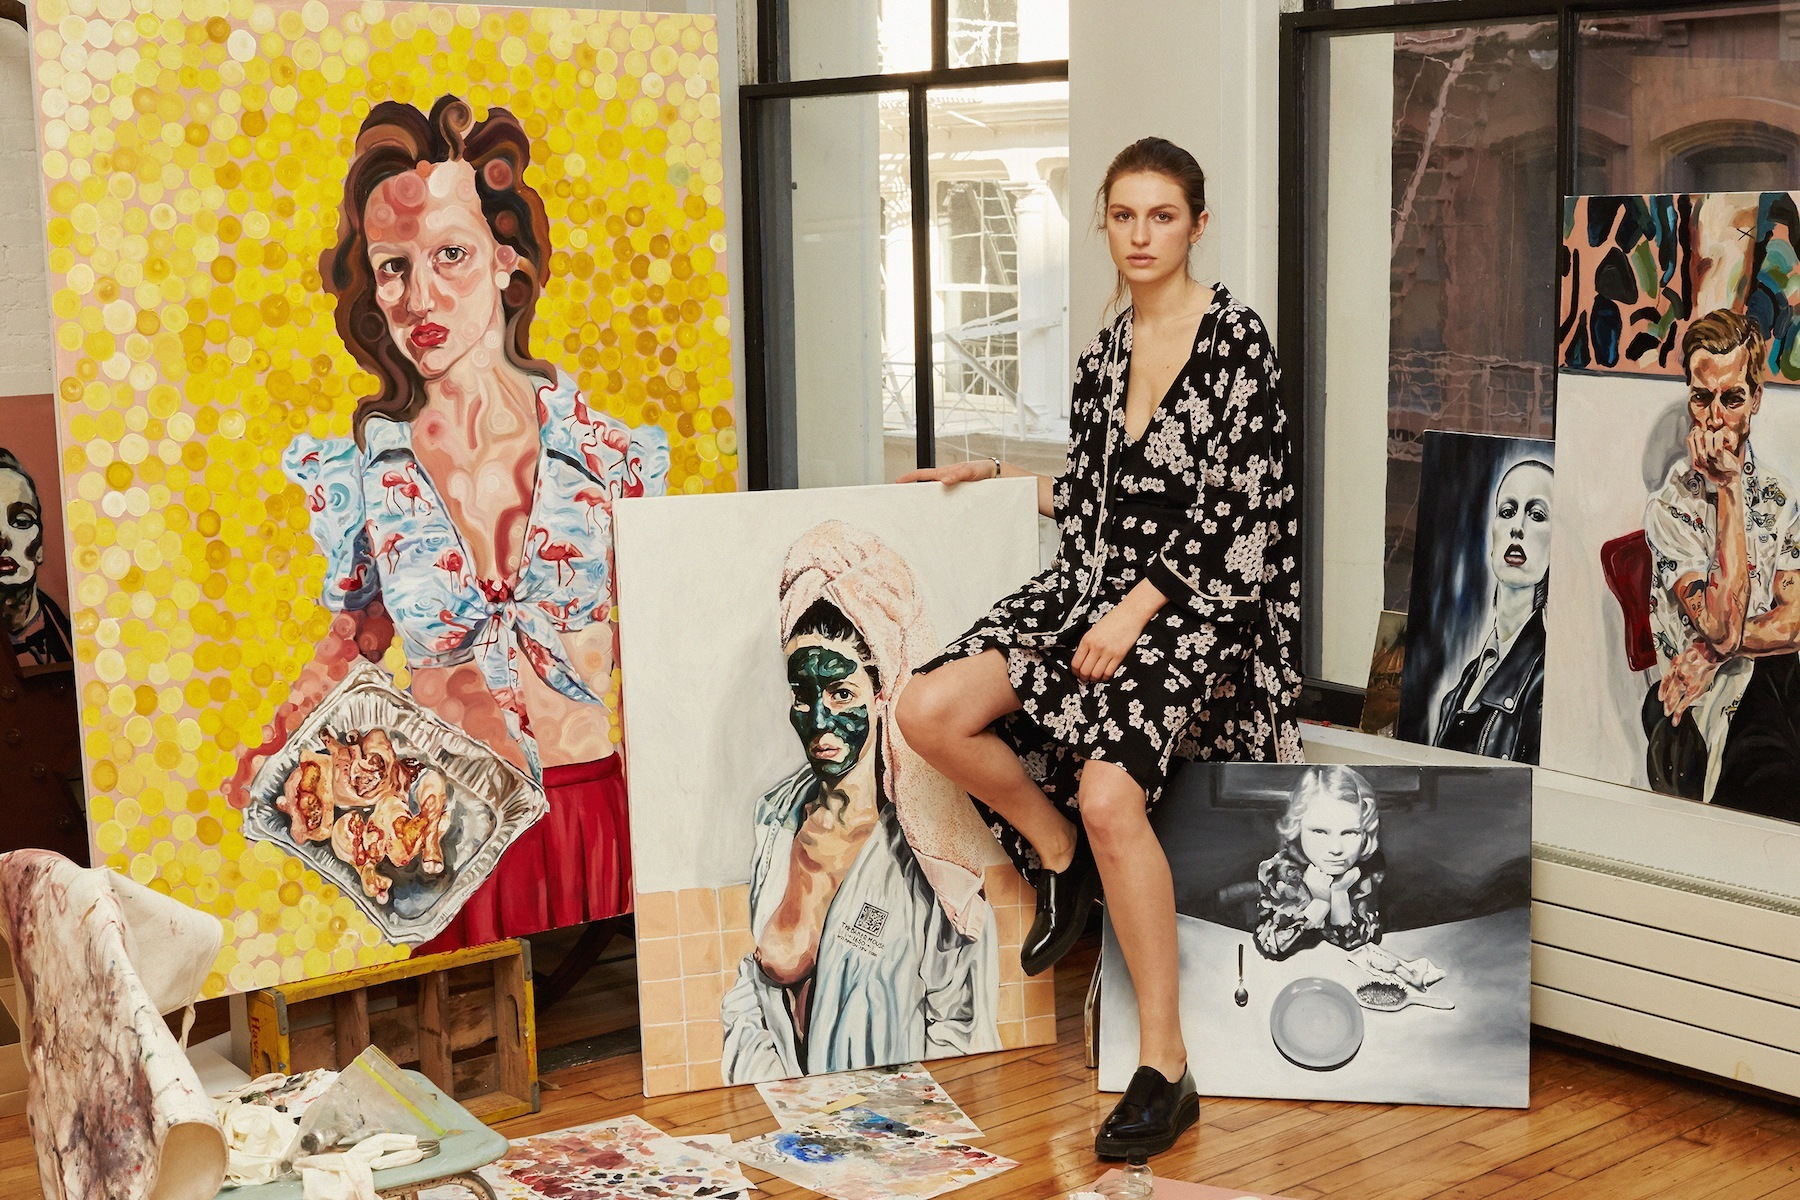 Selfie Tali Lennox nude photos 2019